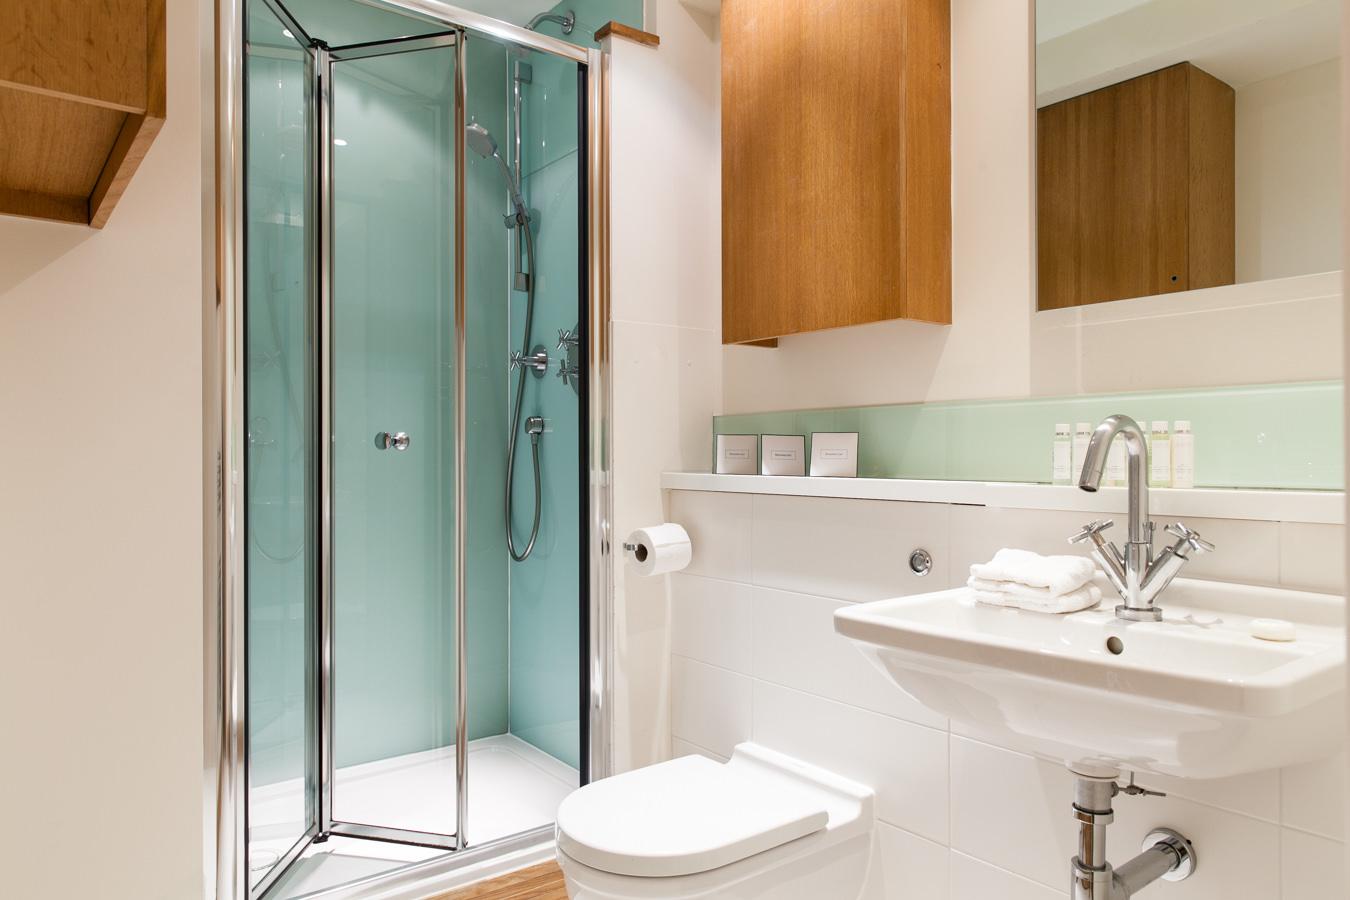 Holborn Serviced Apartments - London Serviced Apartments